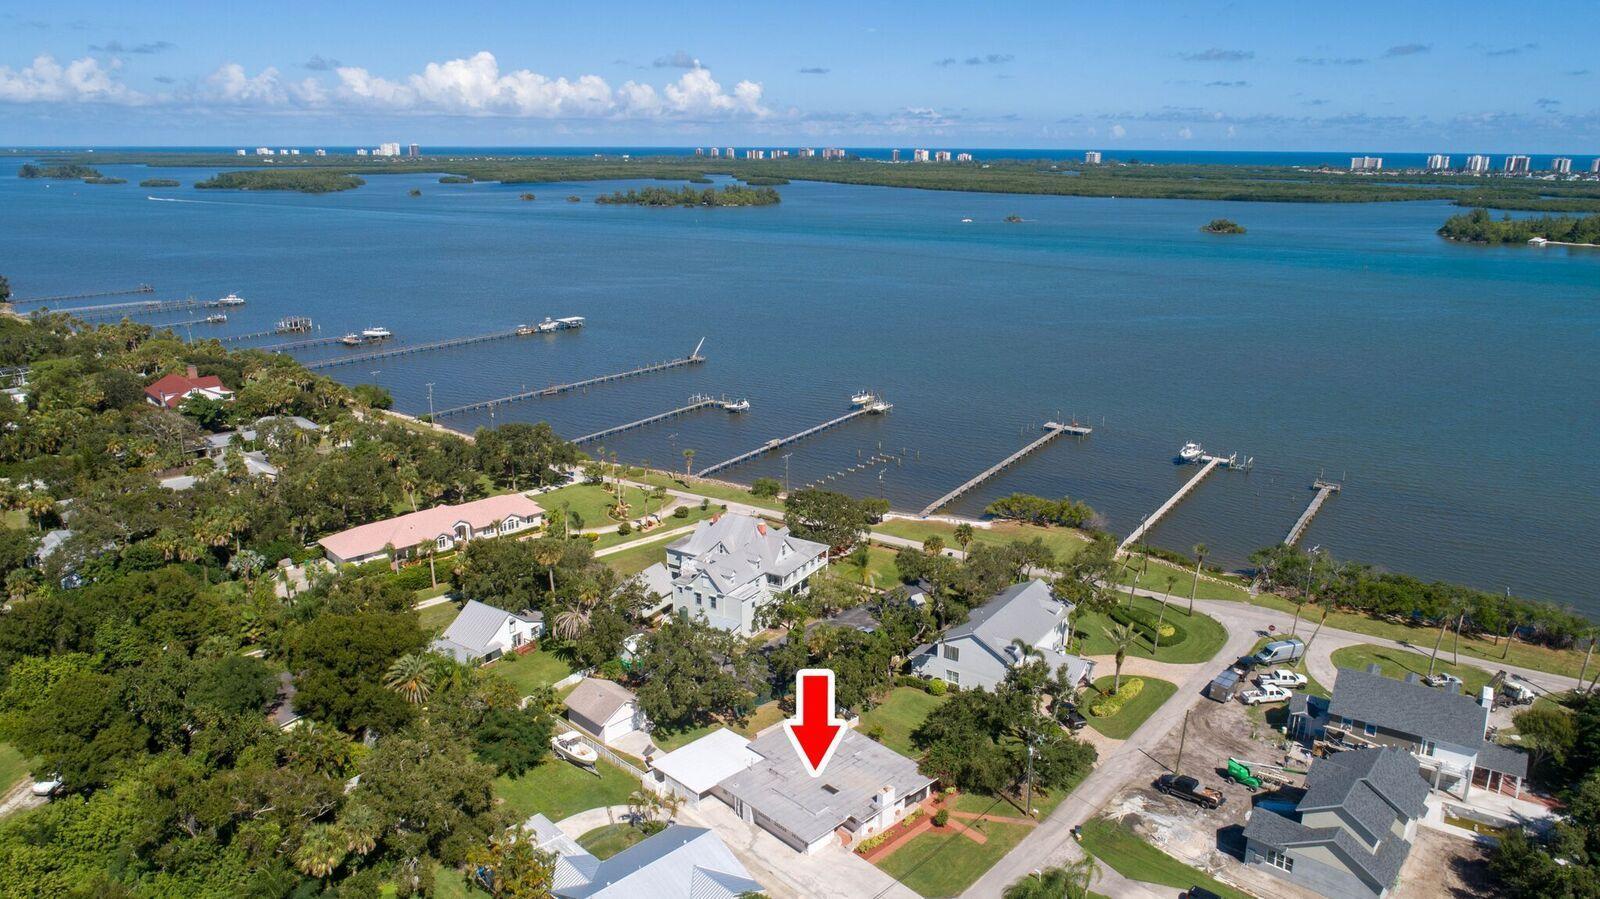 106 Yacht View Lane, Fort Pierce, FL 34946